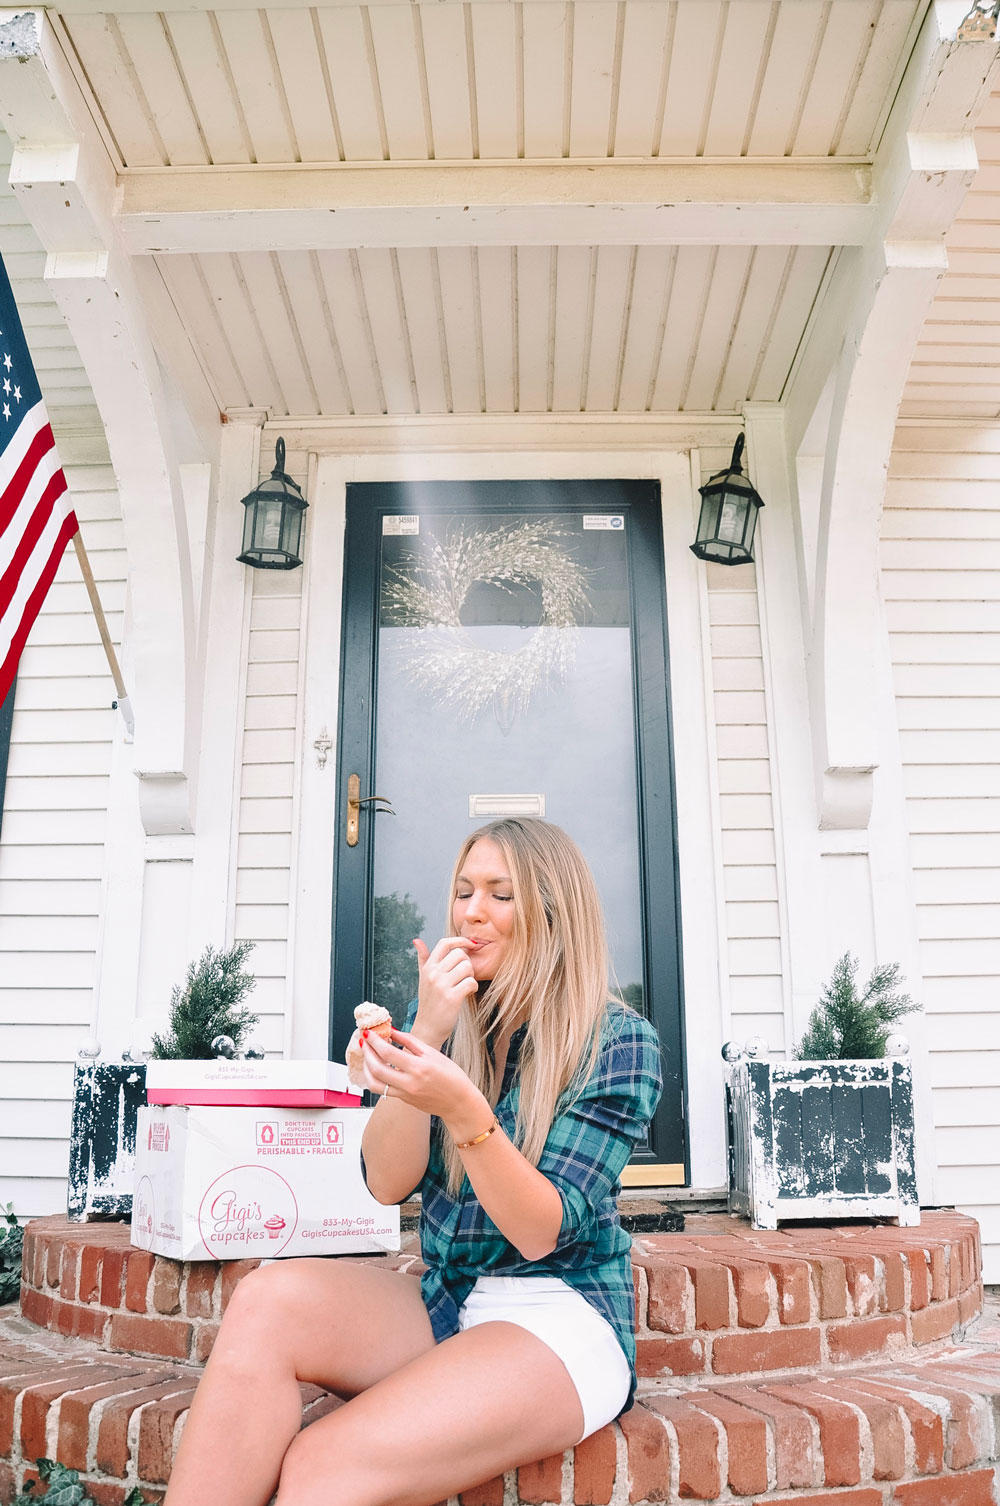 gigi's cupcake delivery